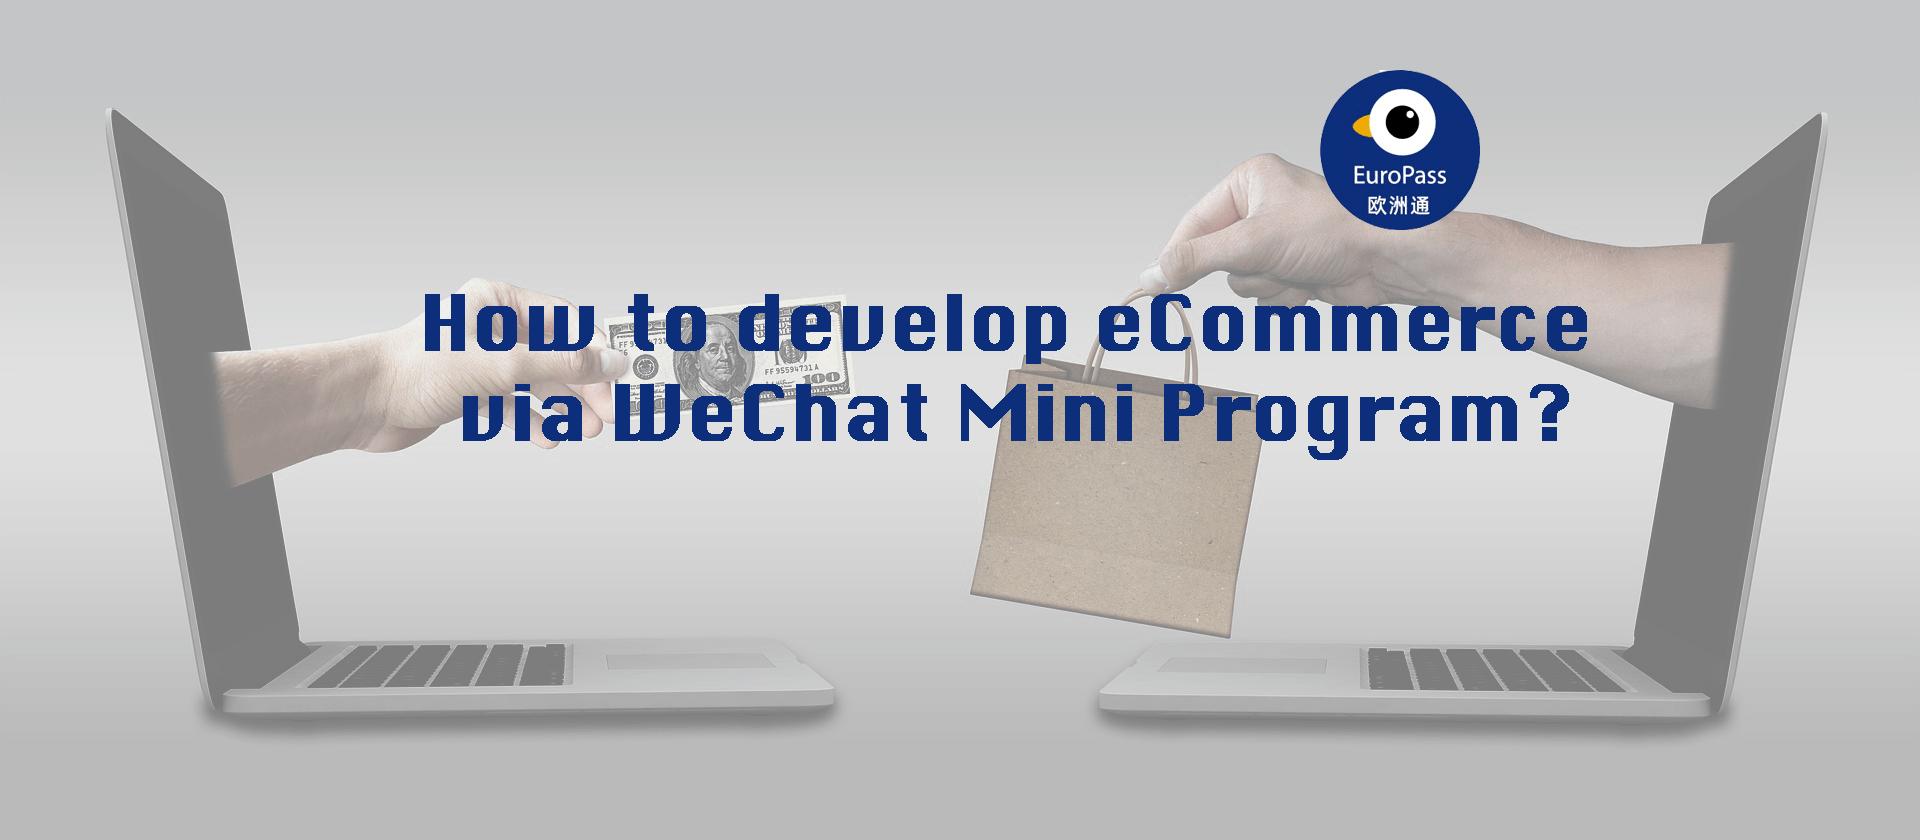 WeChat Mini Program & eCommerce